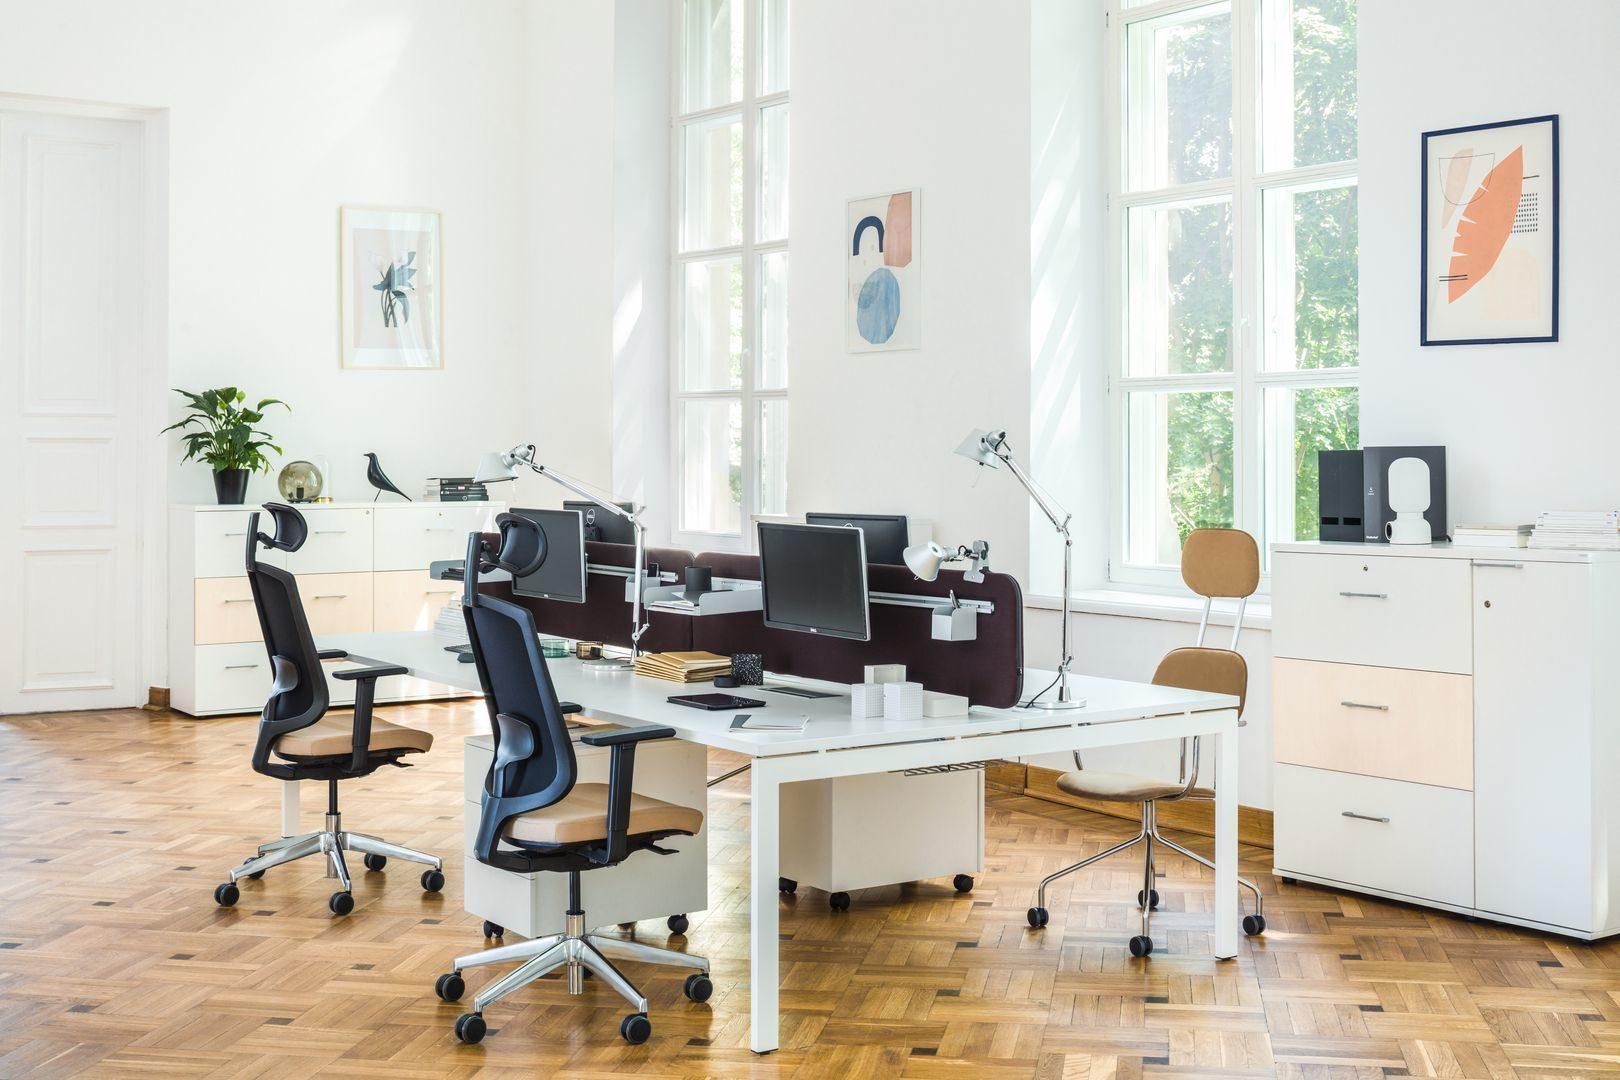 Ogi u bureaux opératifs work mobilier